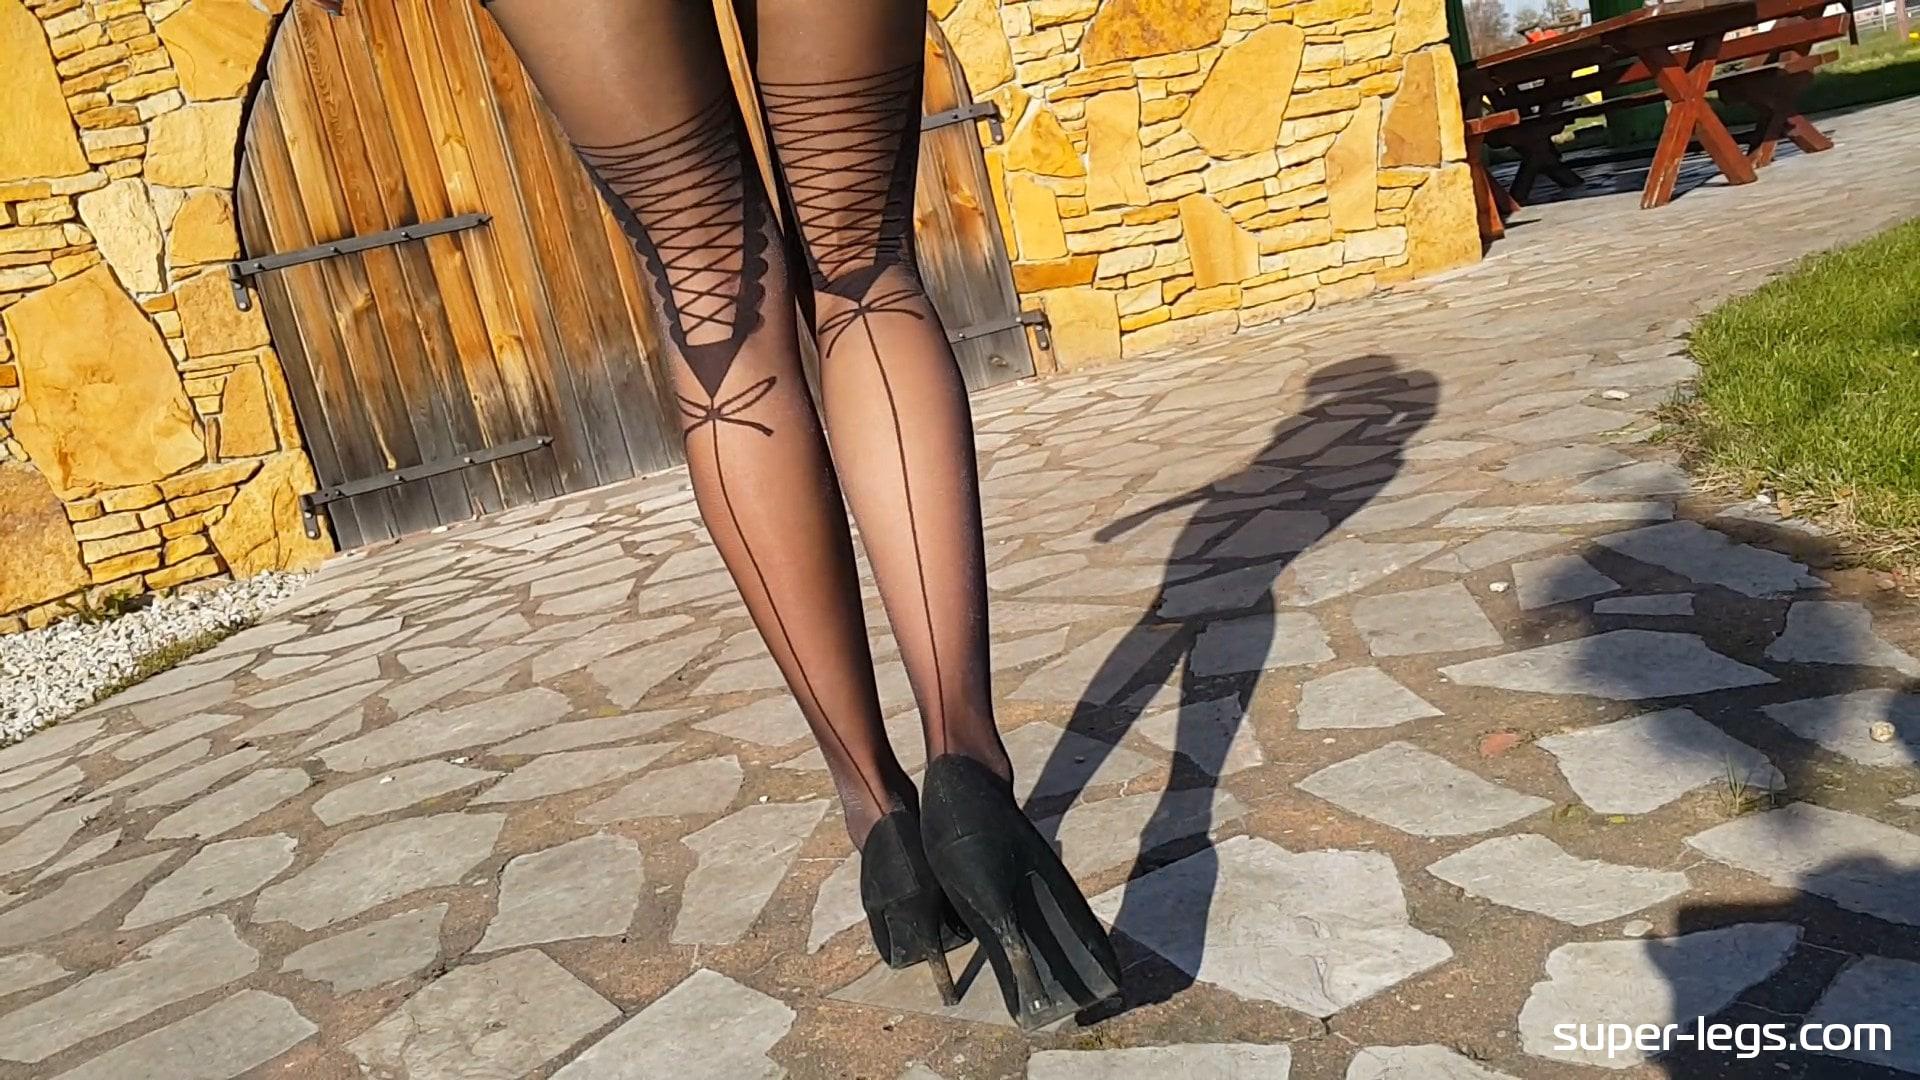 super pantyhose legs sunny day148av-min